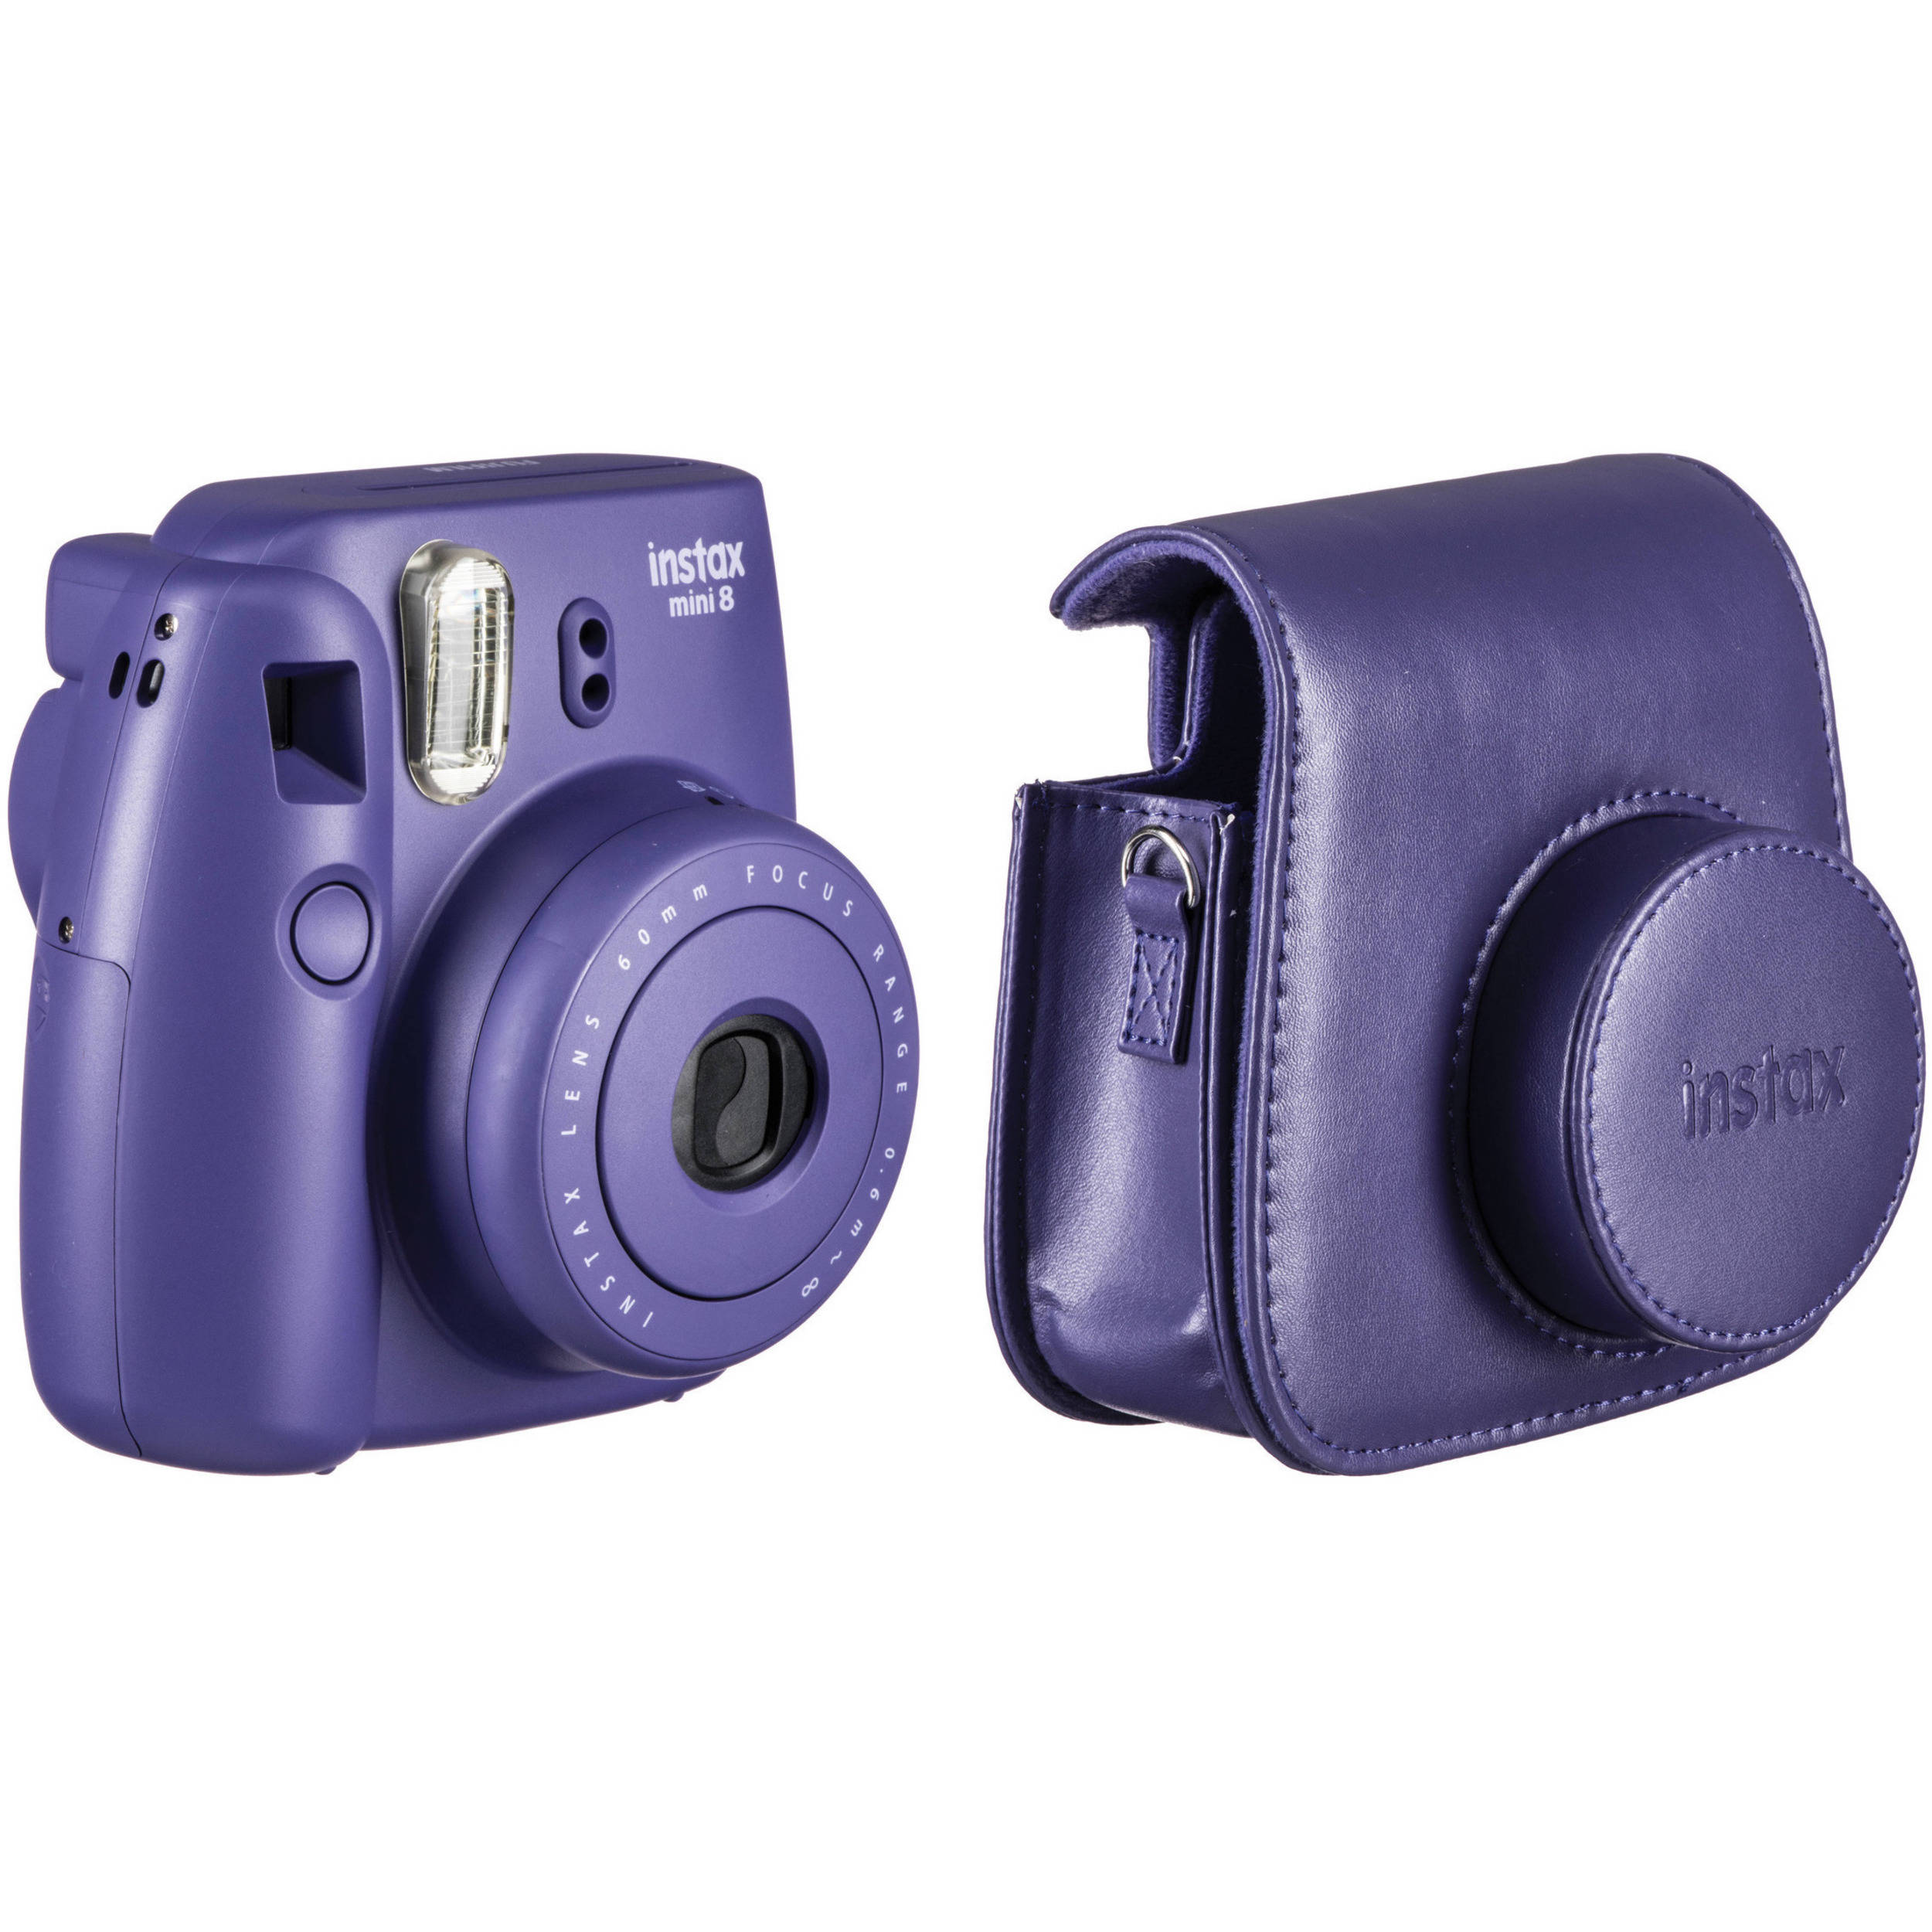 fujifilm instax mini 8 instant film camera and groovy case kit. Black Bedroom Furniture Sets. Home Design Ideas